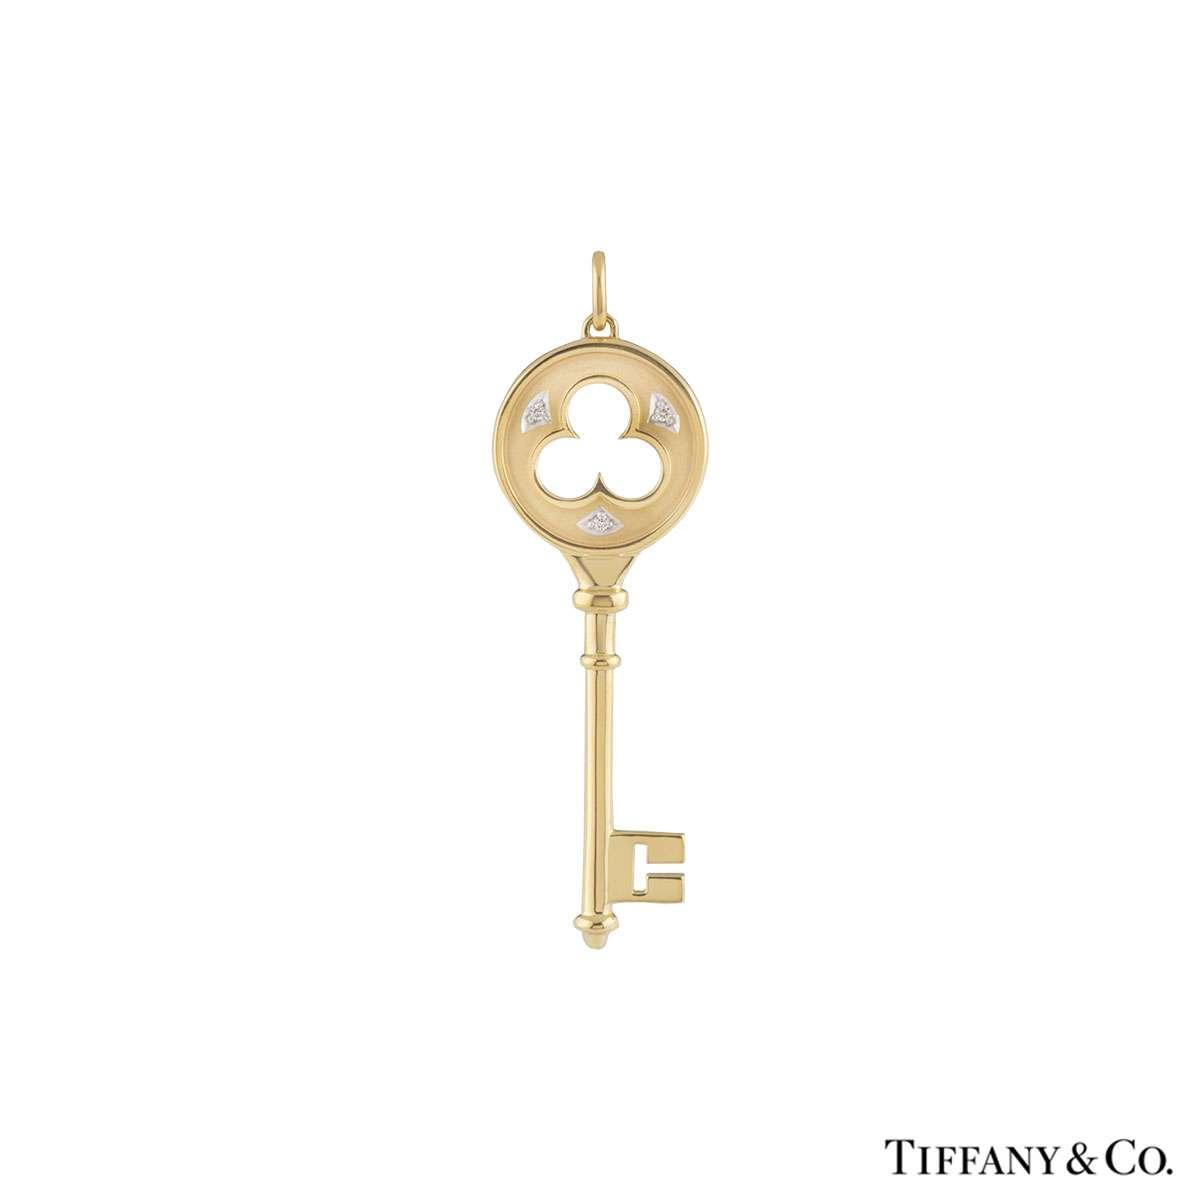 Tiffany & Co. Yellow Gold Diamond Clover Key Pendant